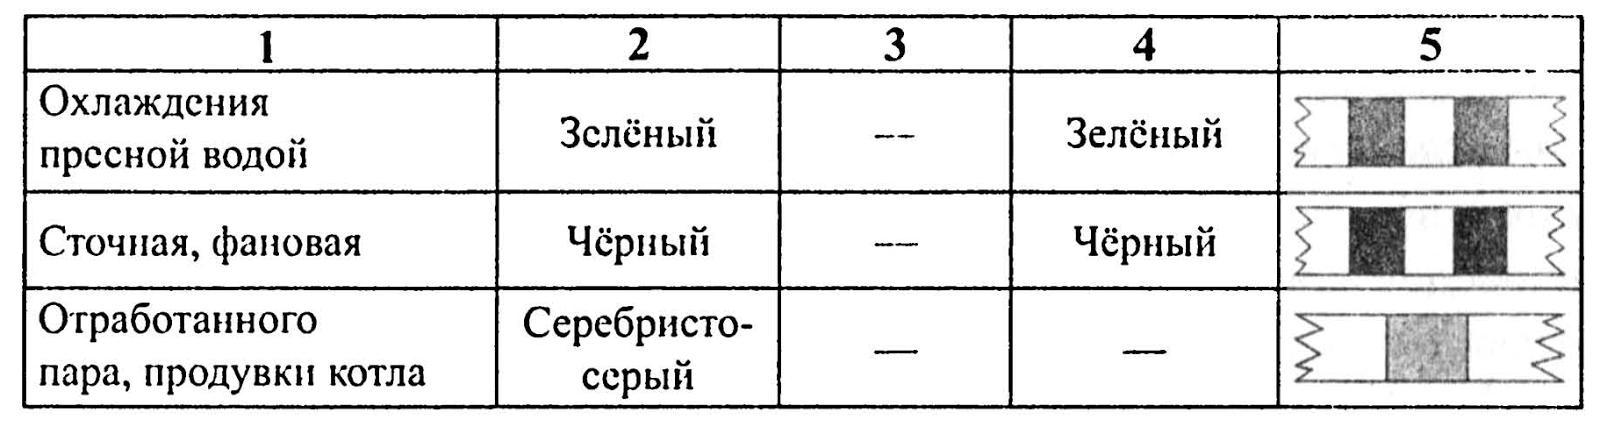 знаки судовых систем: